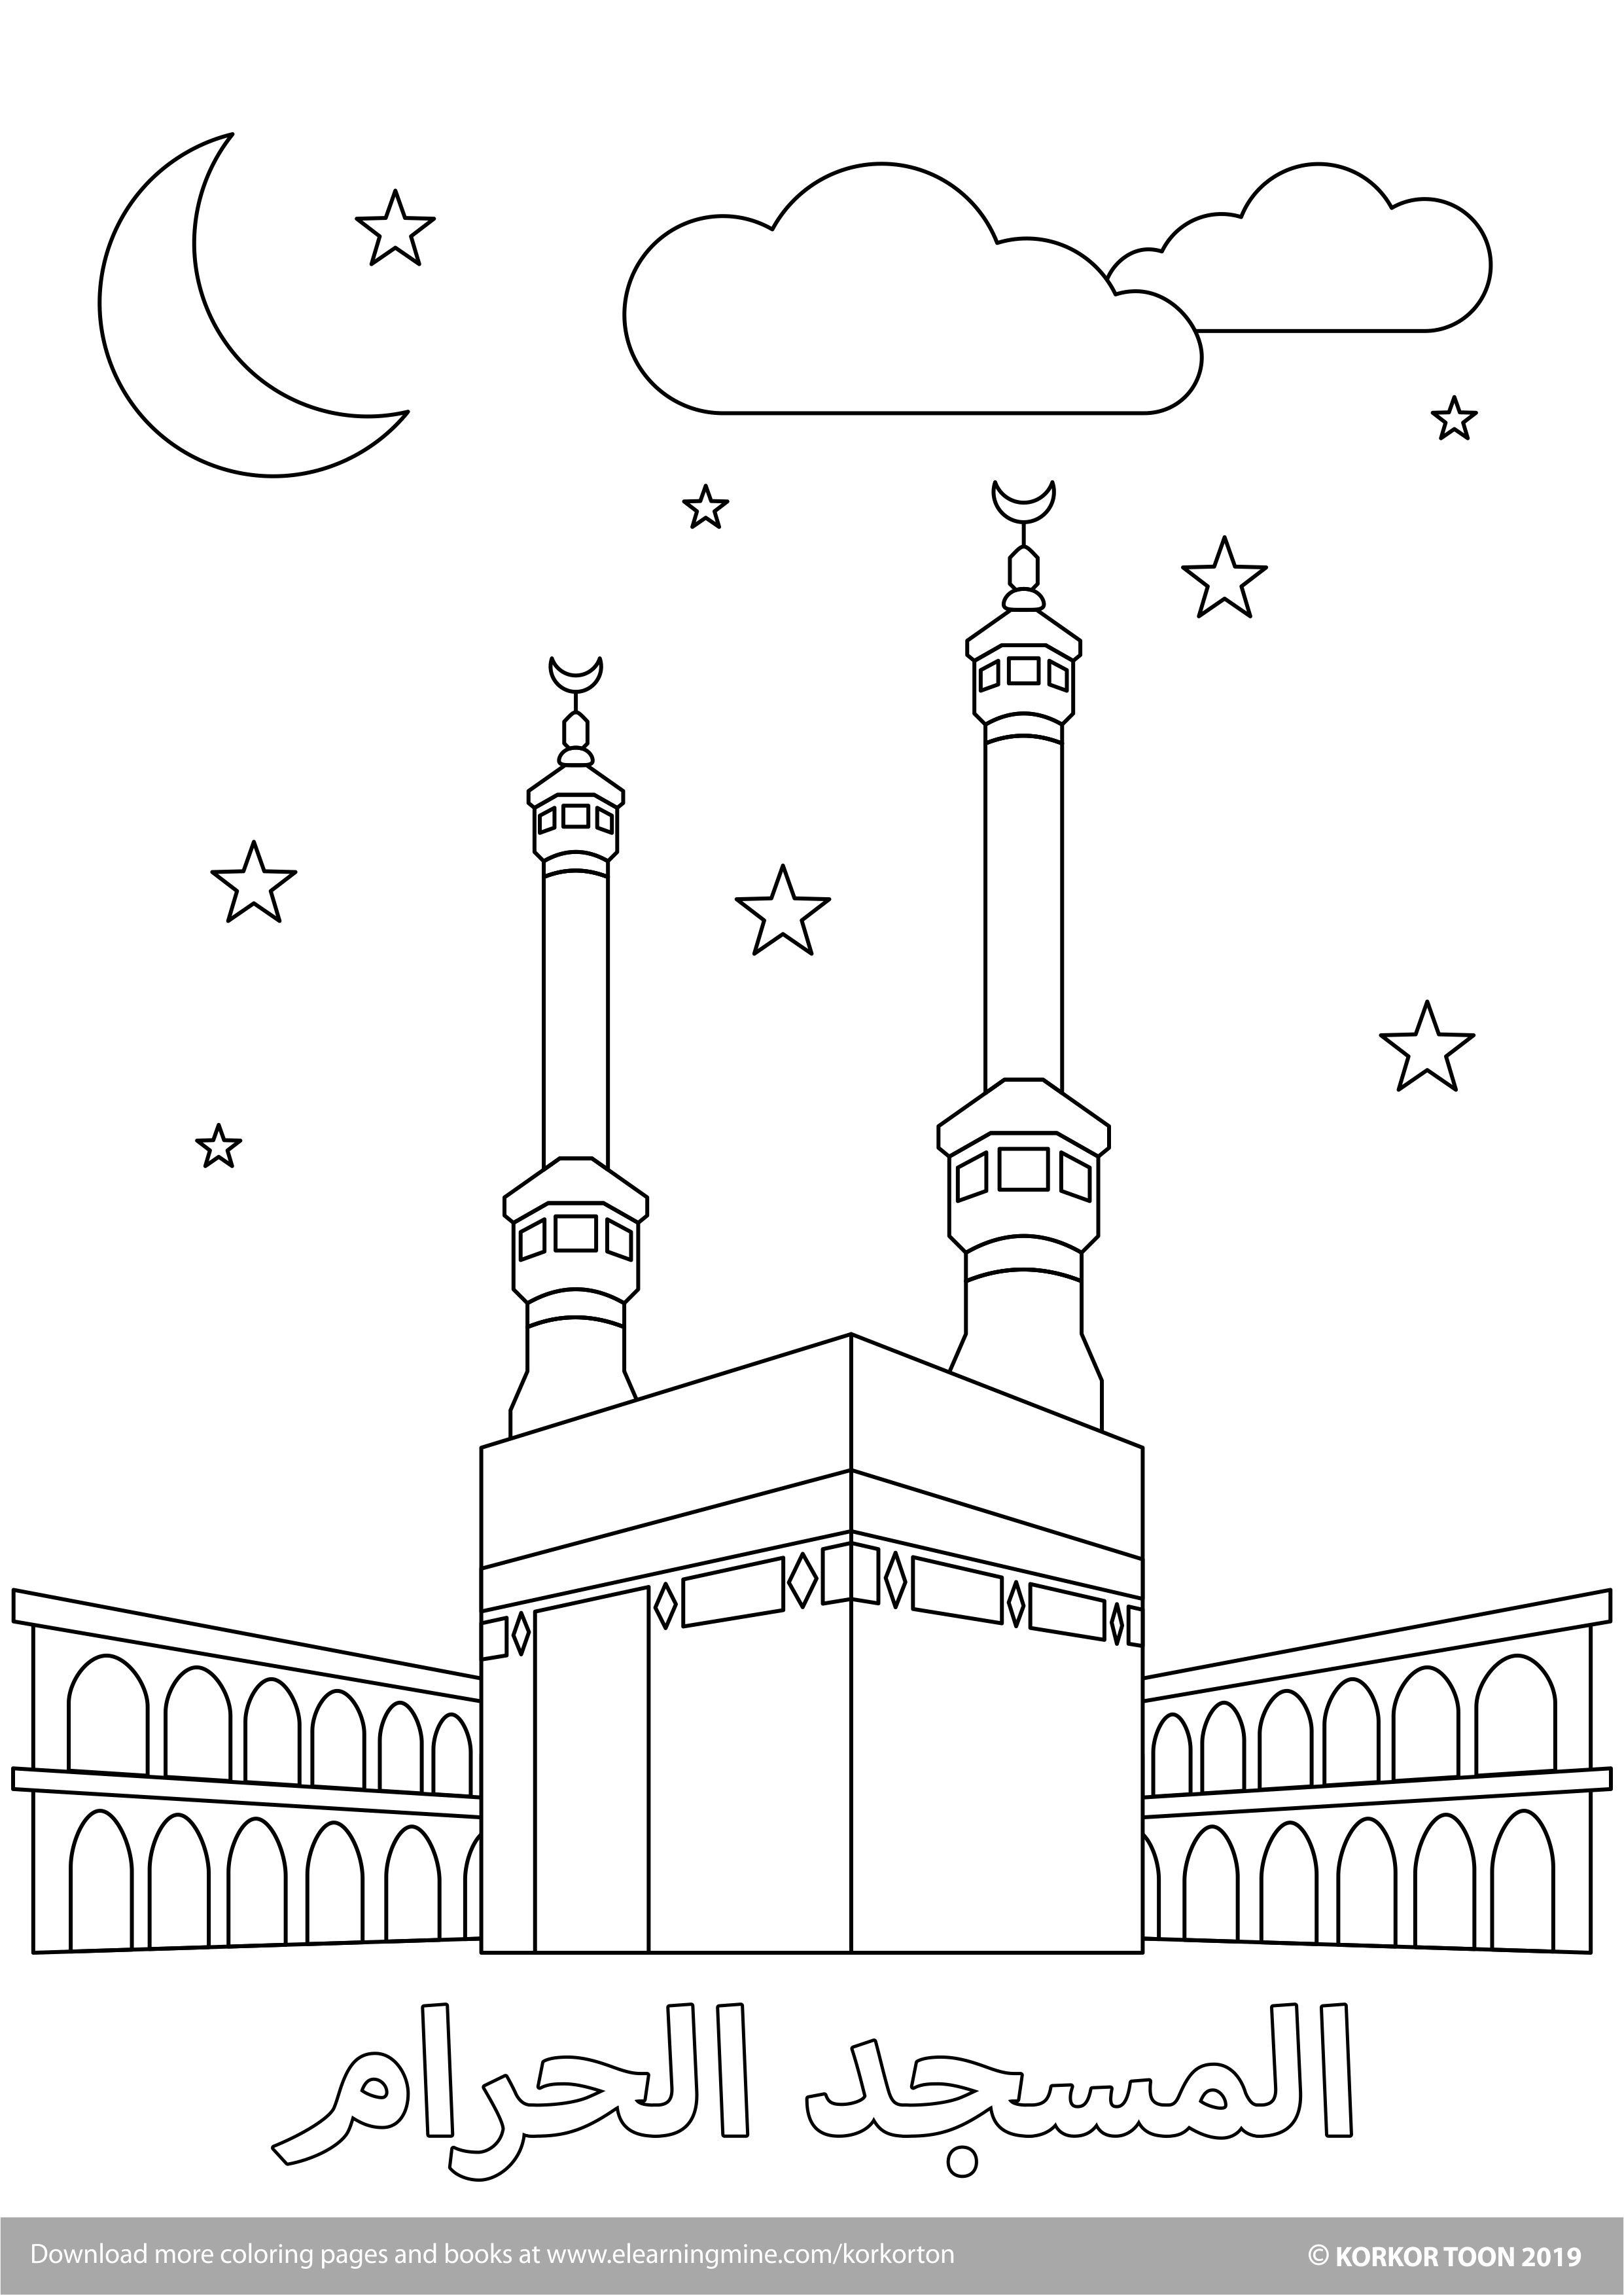 The Holy Mosque Makkah المسجد الحرام مكة Peinture Abstraite Acrylique Coloriage Peinture Abstraite